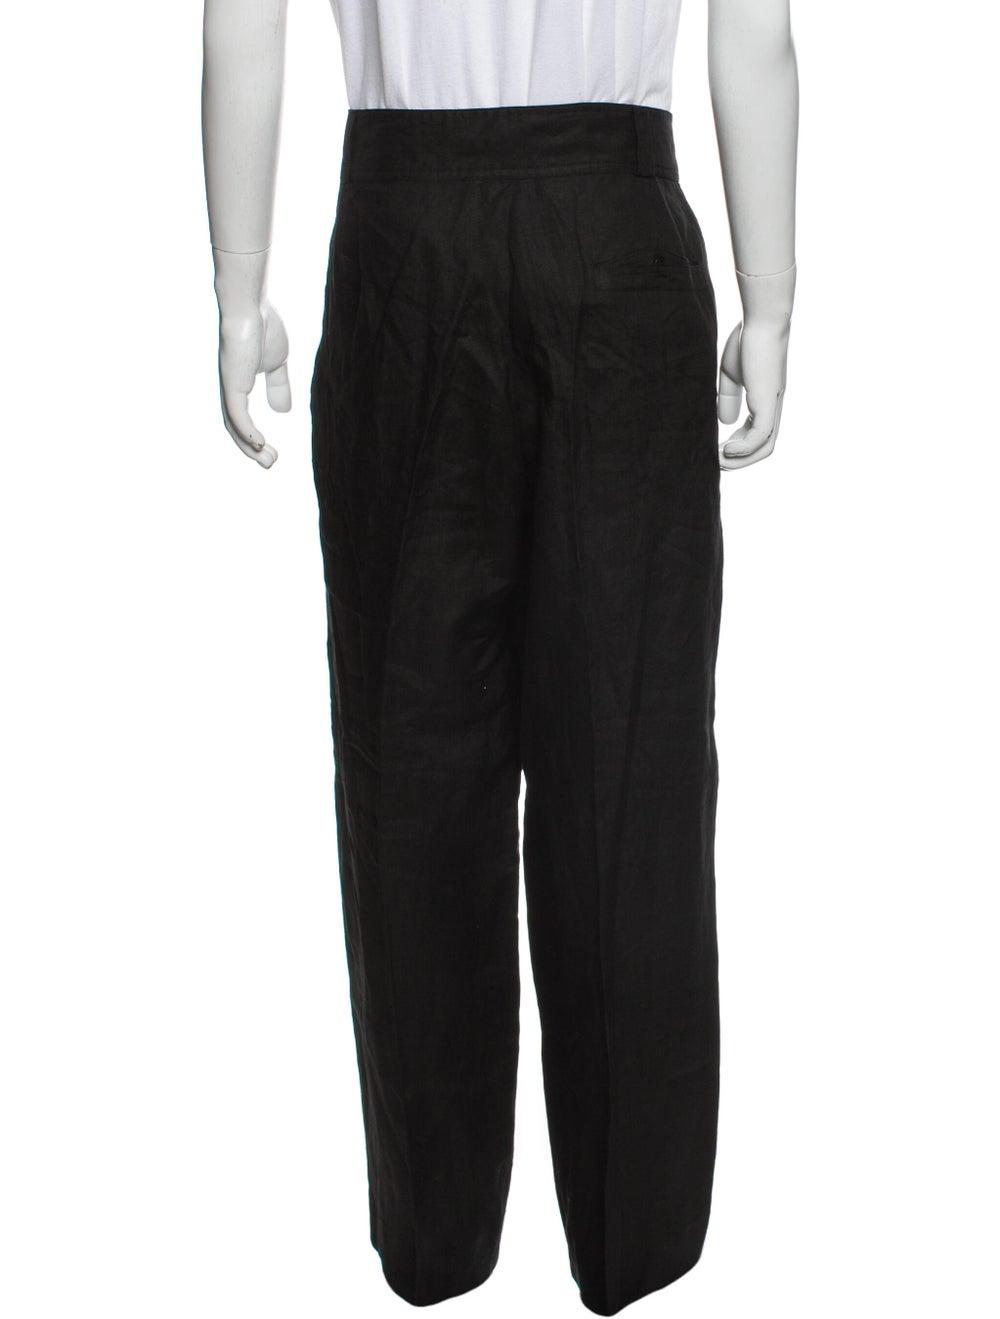 Gianni Versace Vintage Pants Black - image 3